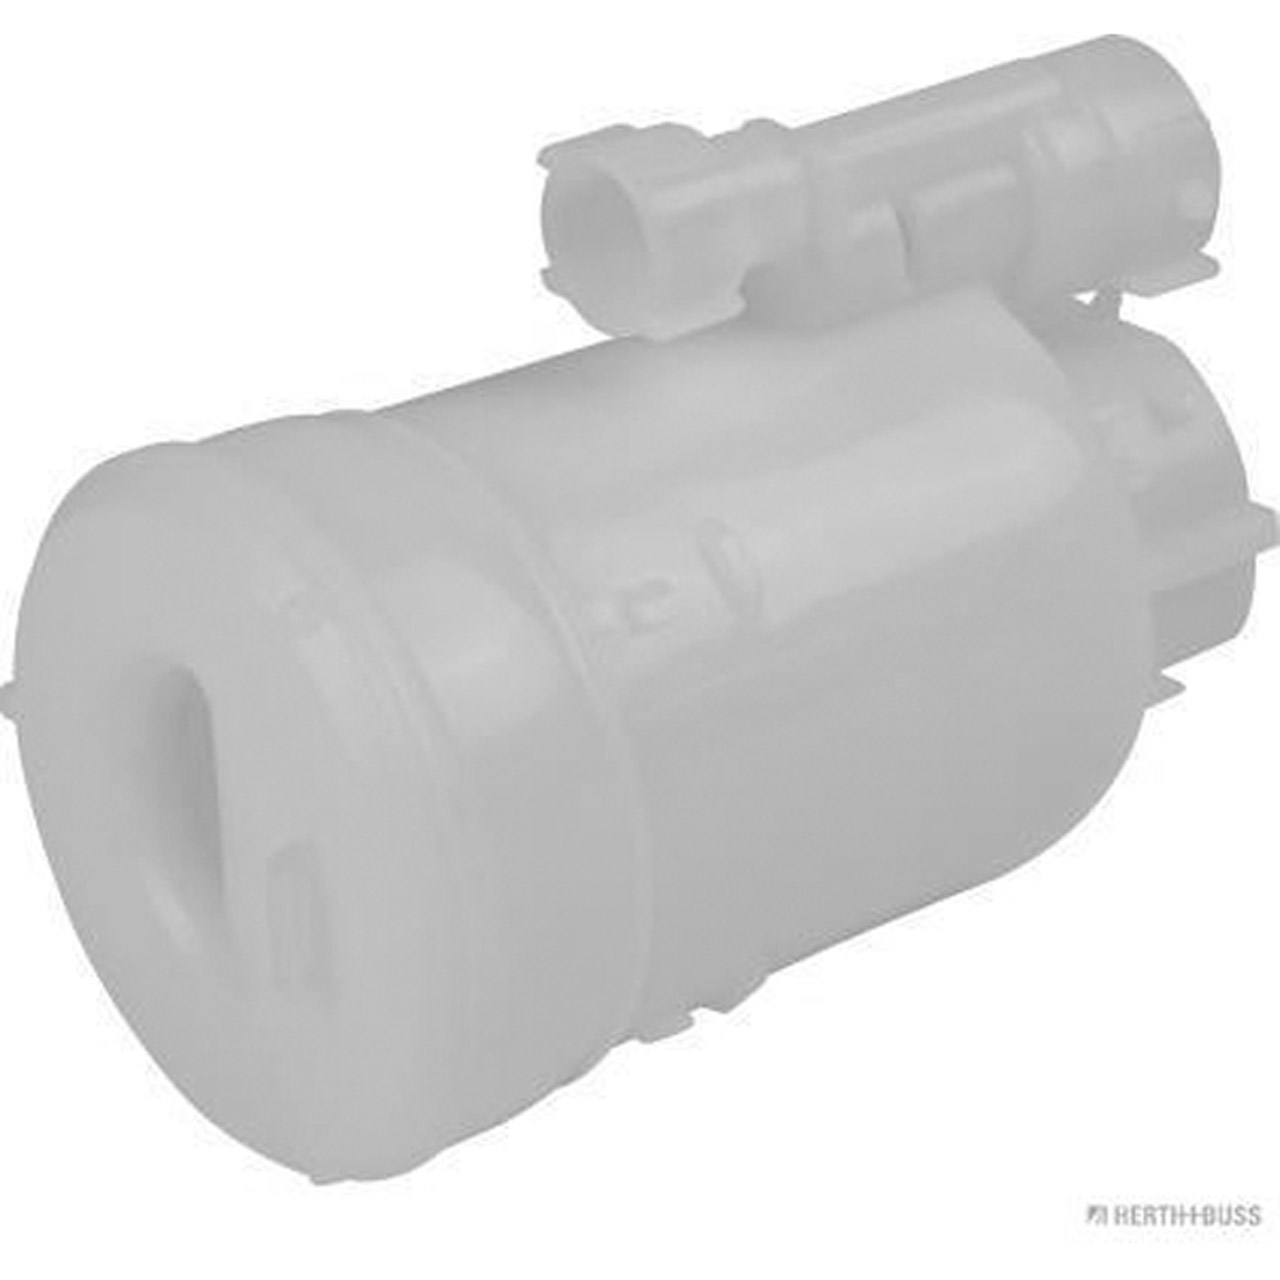 HERTH+BUSS JAKOPARTS J1330539 Kraftstofffilter Dieselfilter HYUNDAI i40 + CW 1.6/2.0 GDI